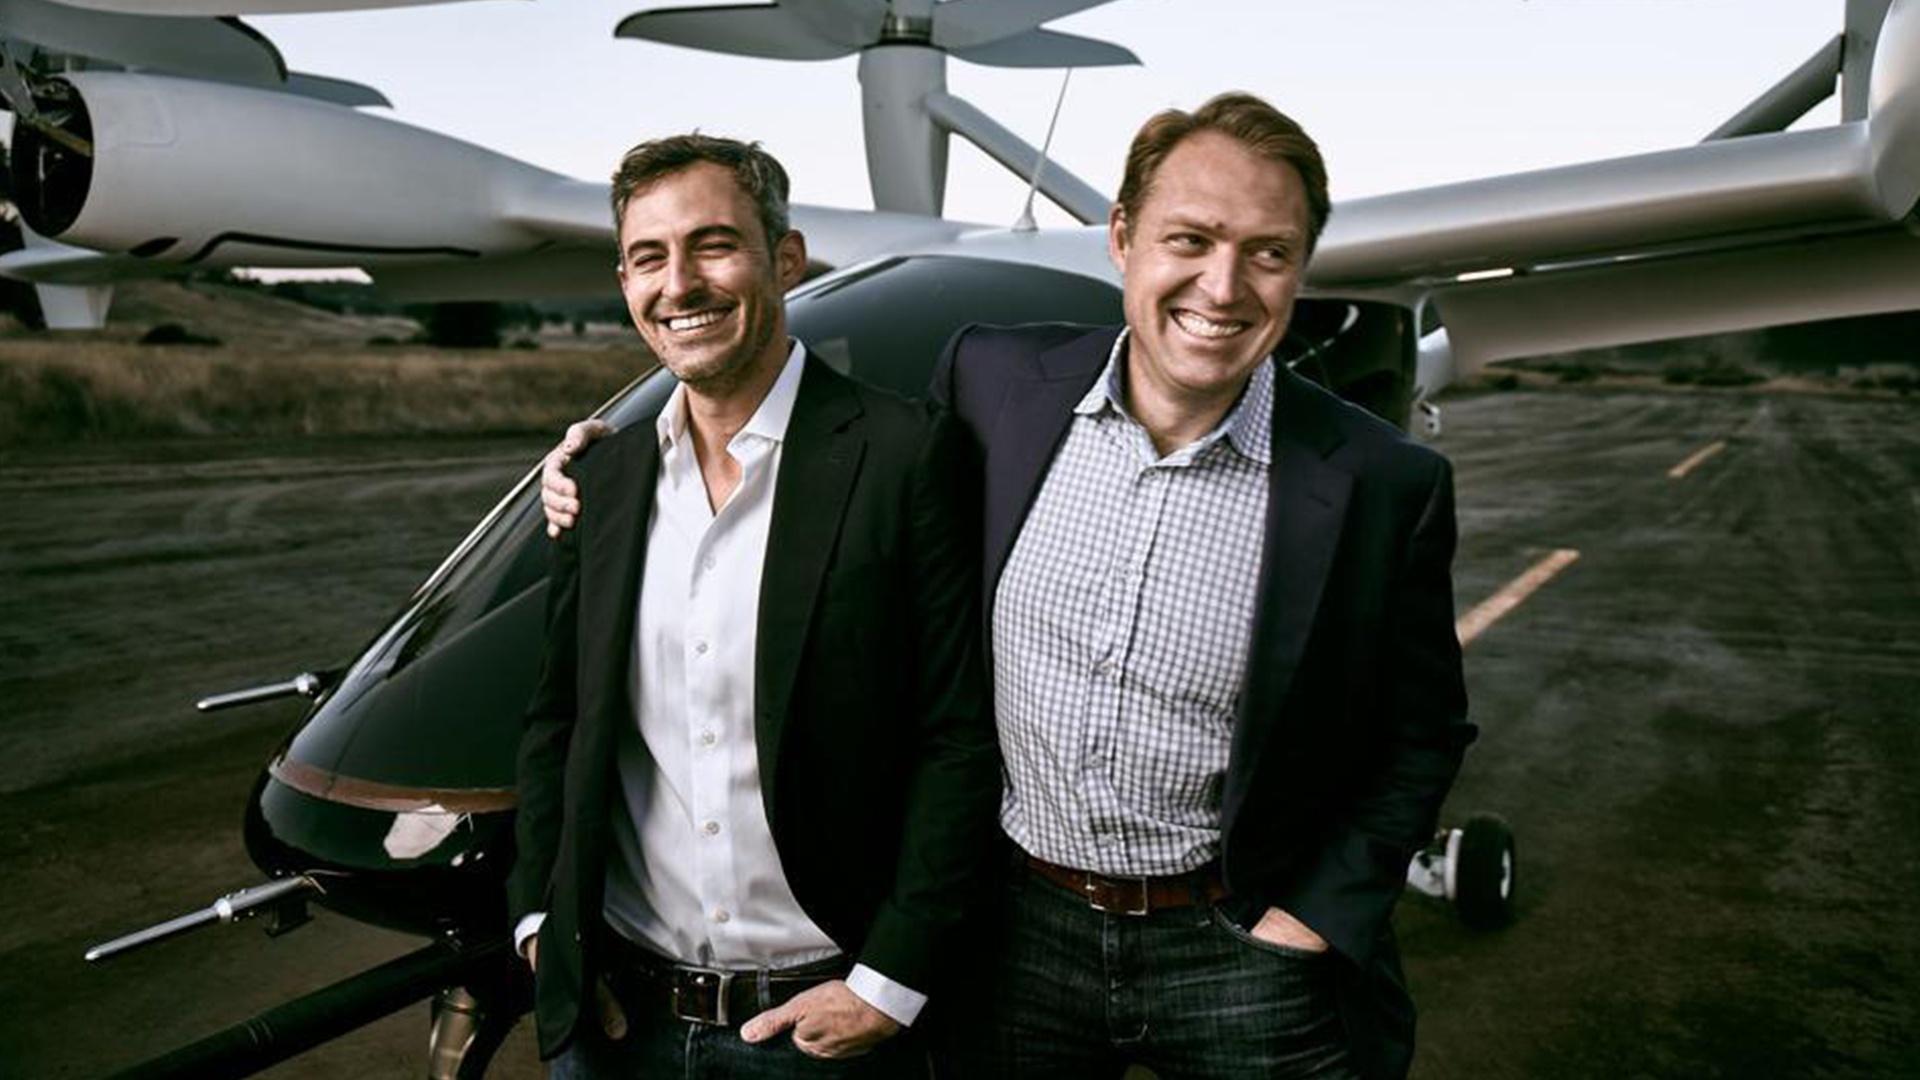 Стартап Air Taxi Joby выходит на IPO в результате слияния с компанией SPAC от LinkedIn и основателями Zynga